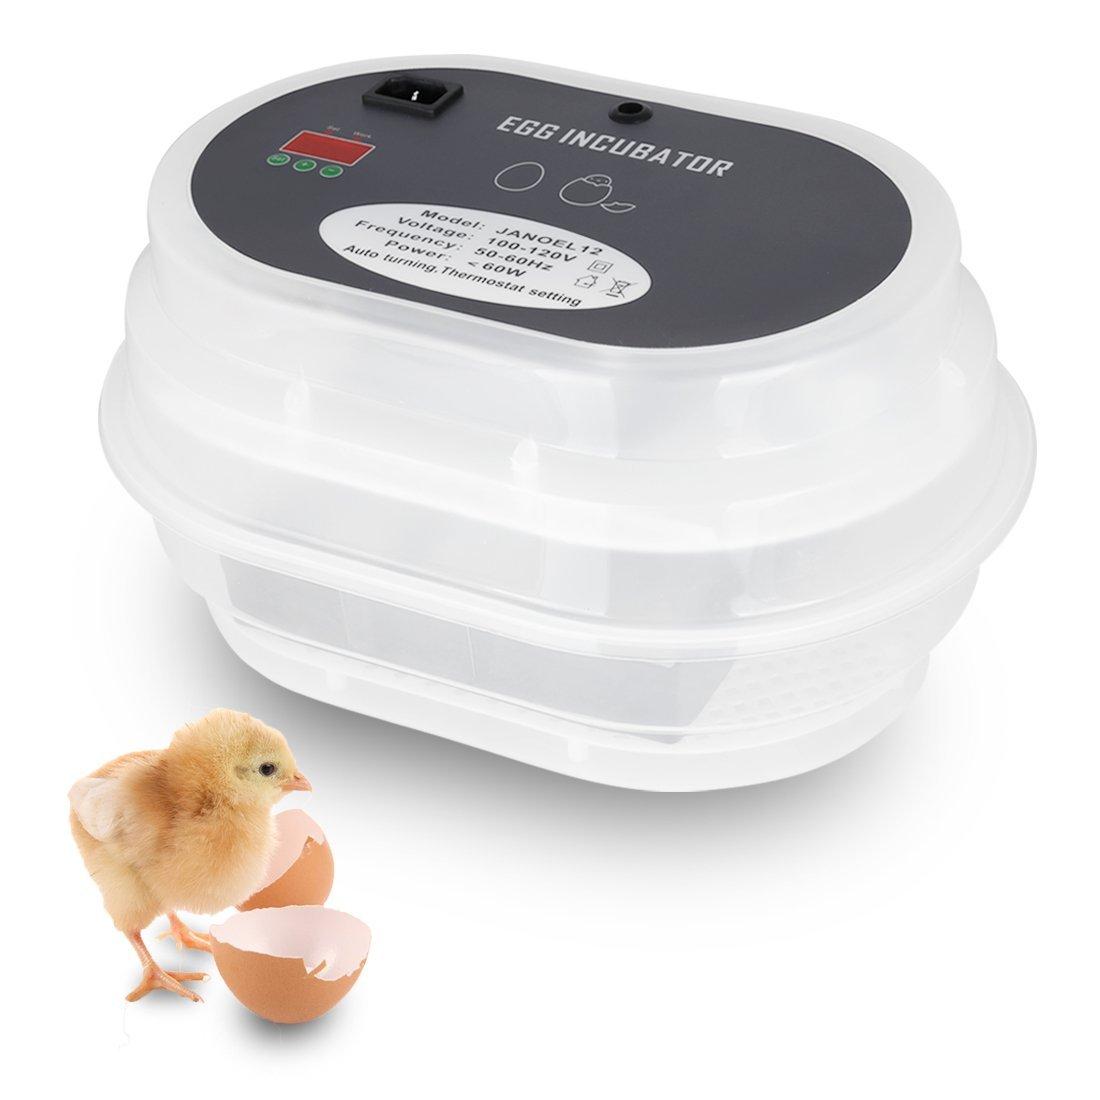 VIVOHOME Mini Digital Fully Automatic 9-12 Egg Incubator Temperature Control Poultry Hatcher Machine for Chicken Duck Bird Quail